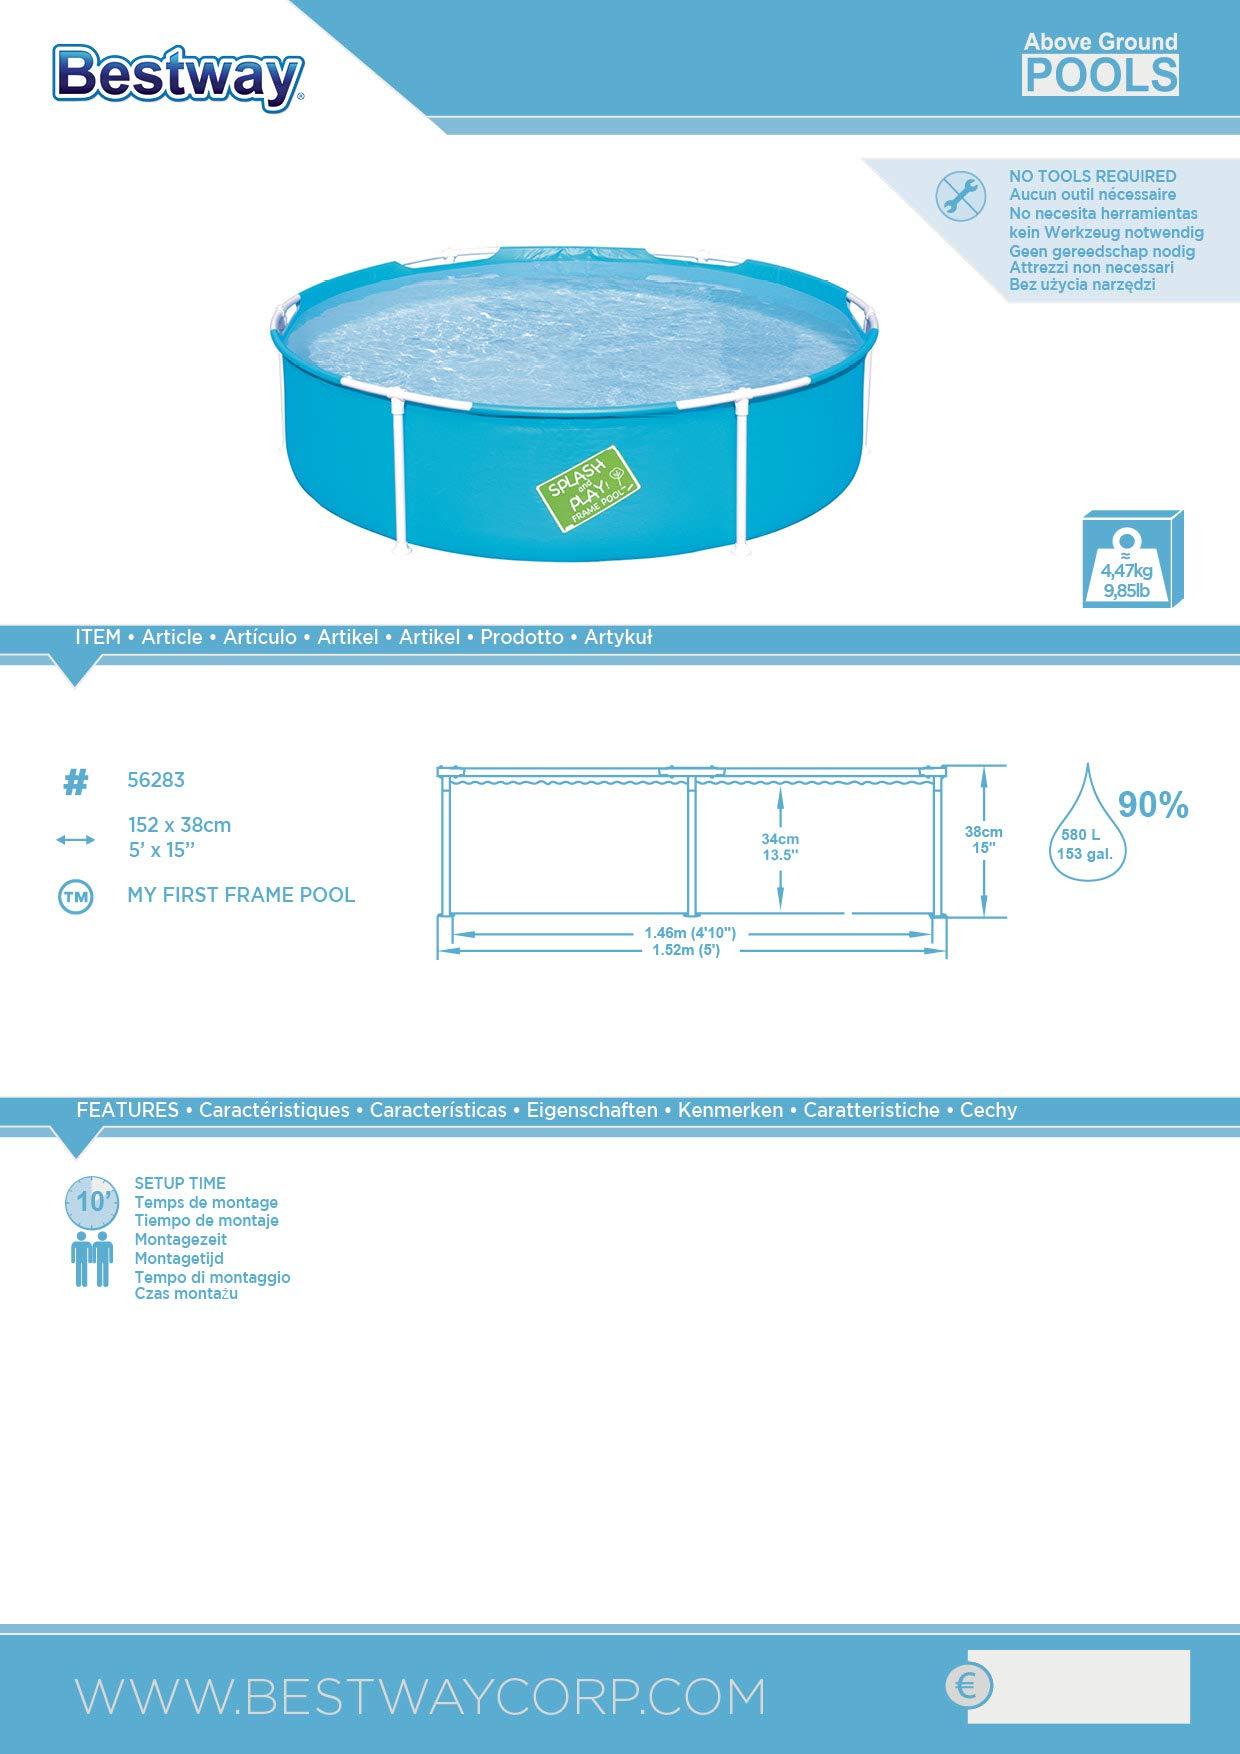 Bestway 56283 – Piscina Desmontable Tubular Infantil Mi Primera Piscina 152×38 cm